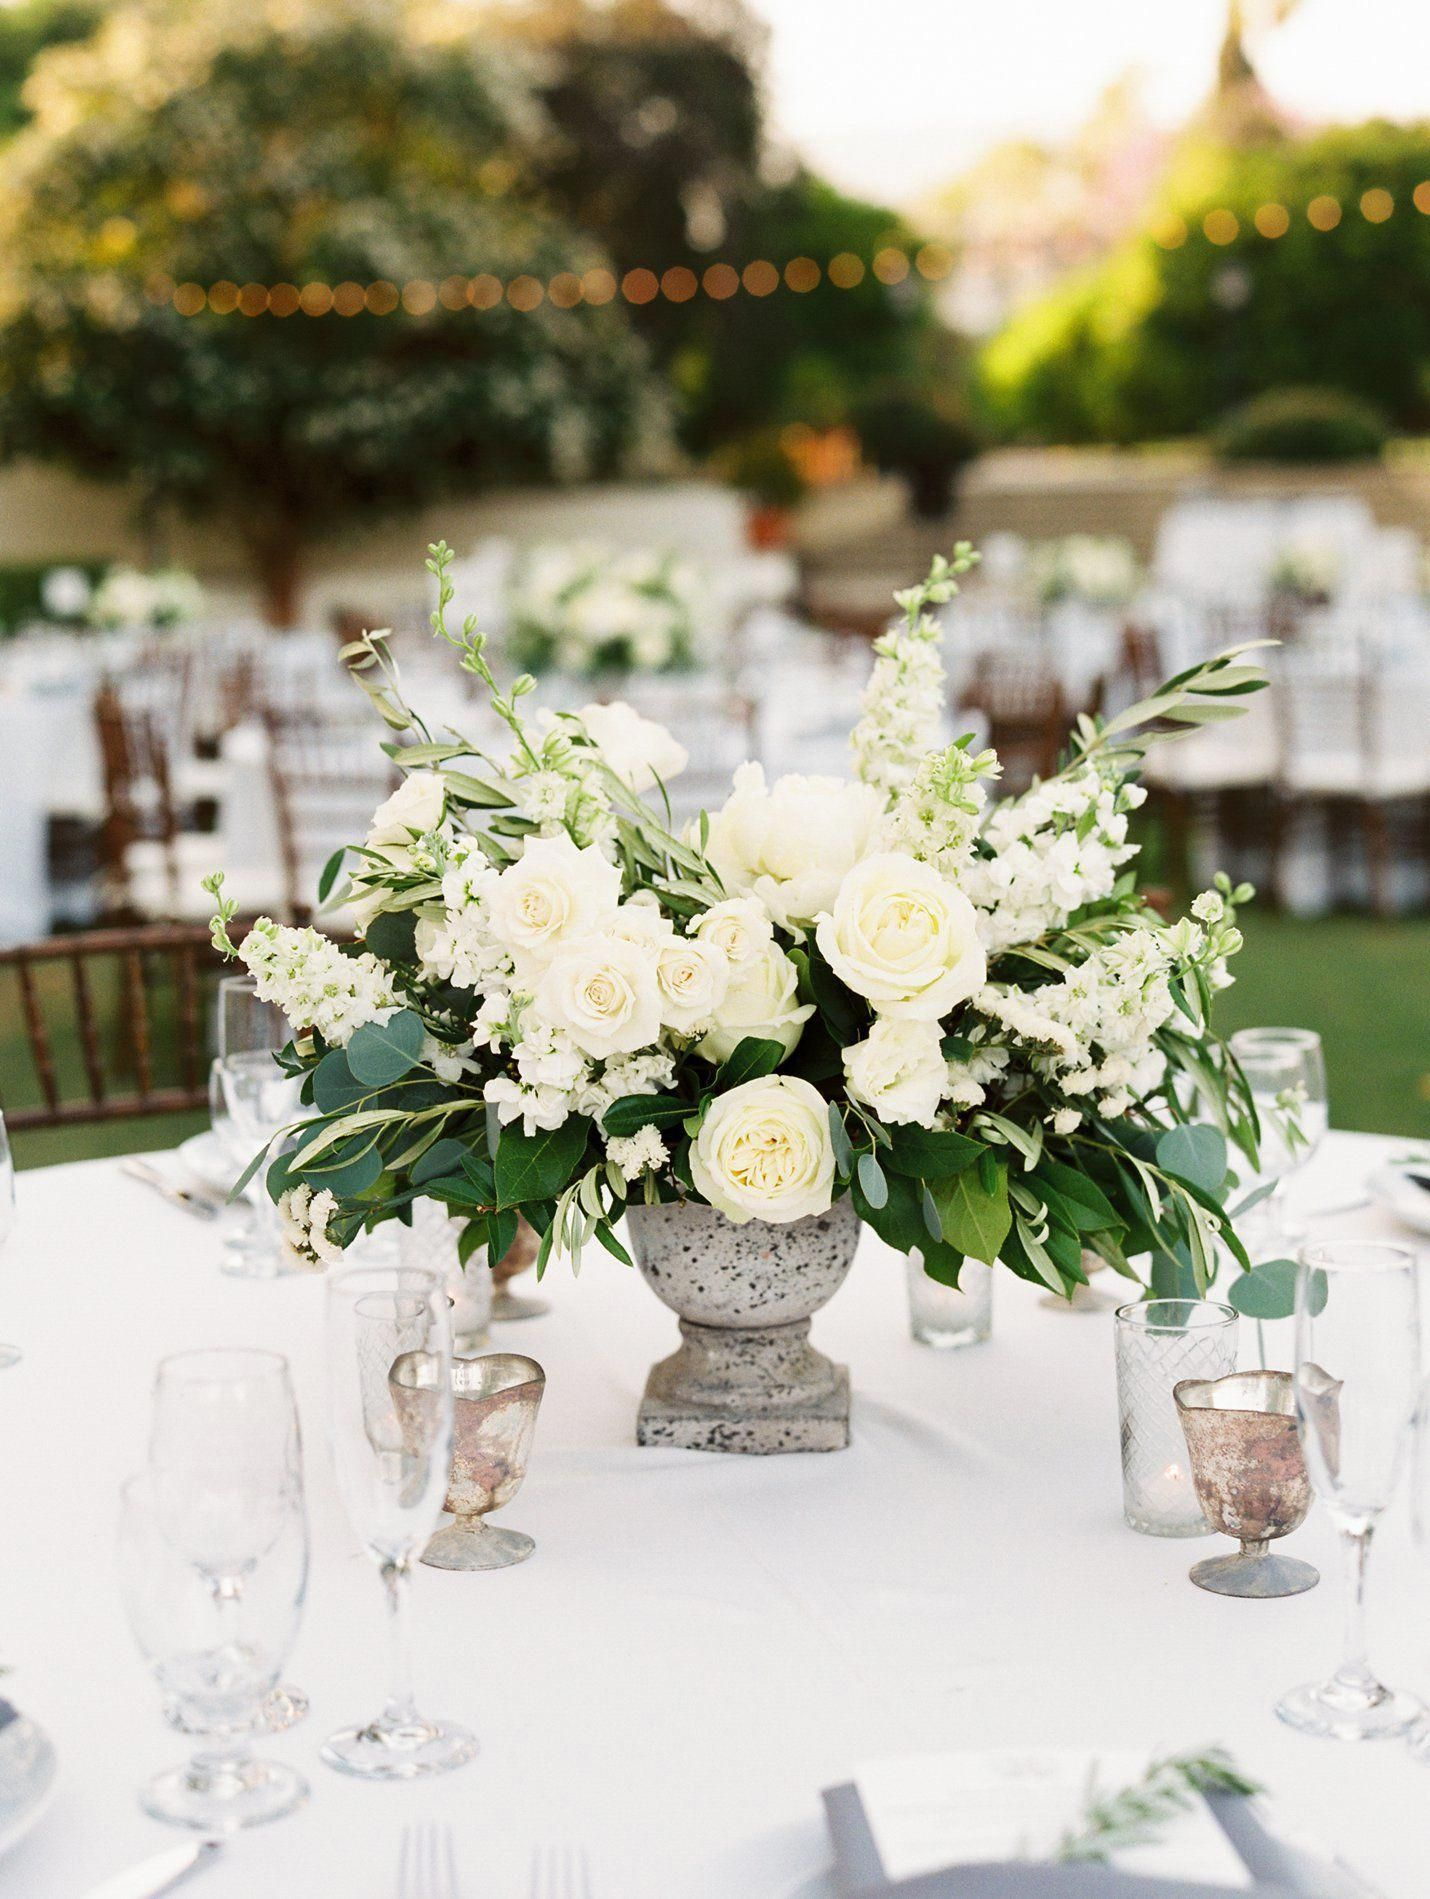 For elegant but economical wedding ceremony accessories ...